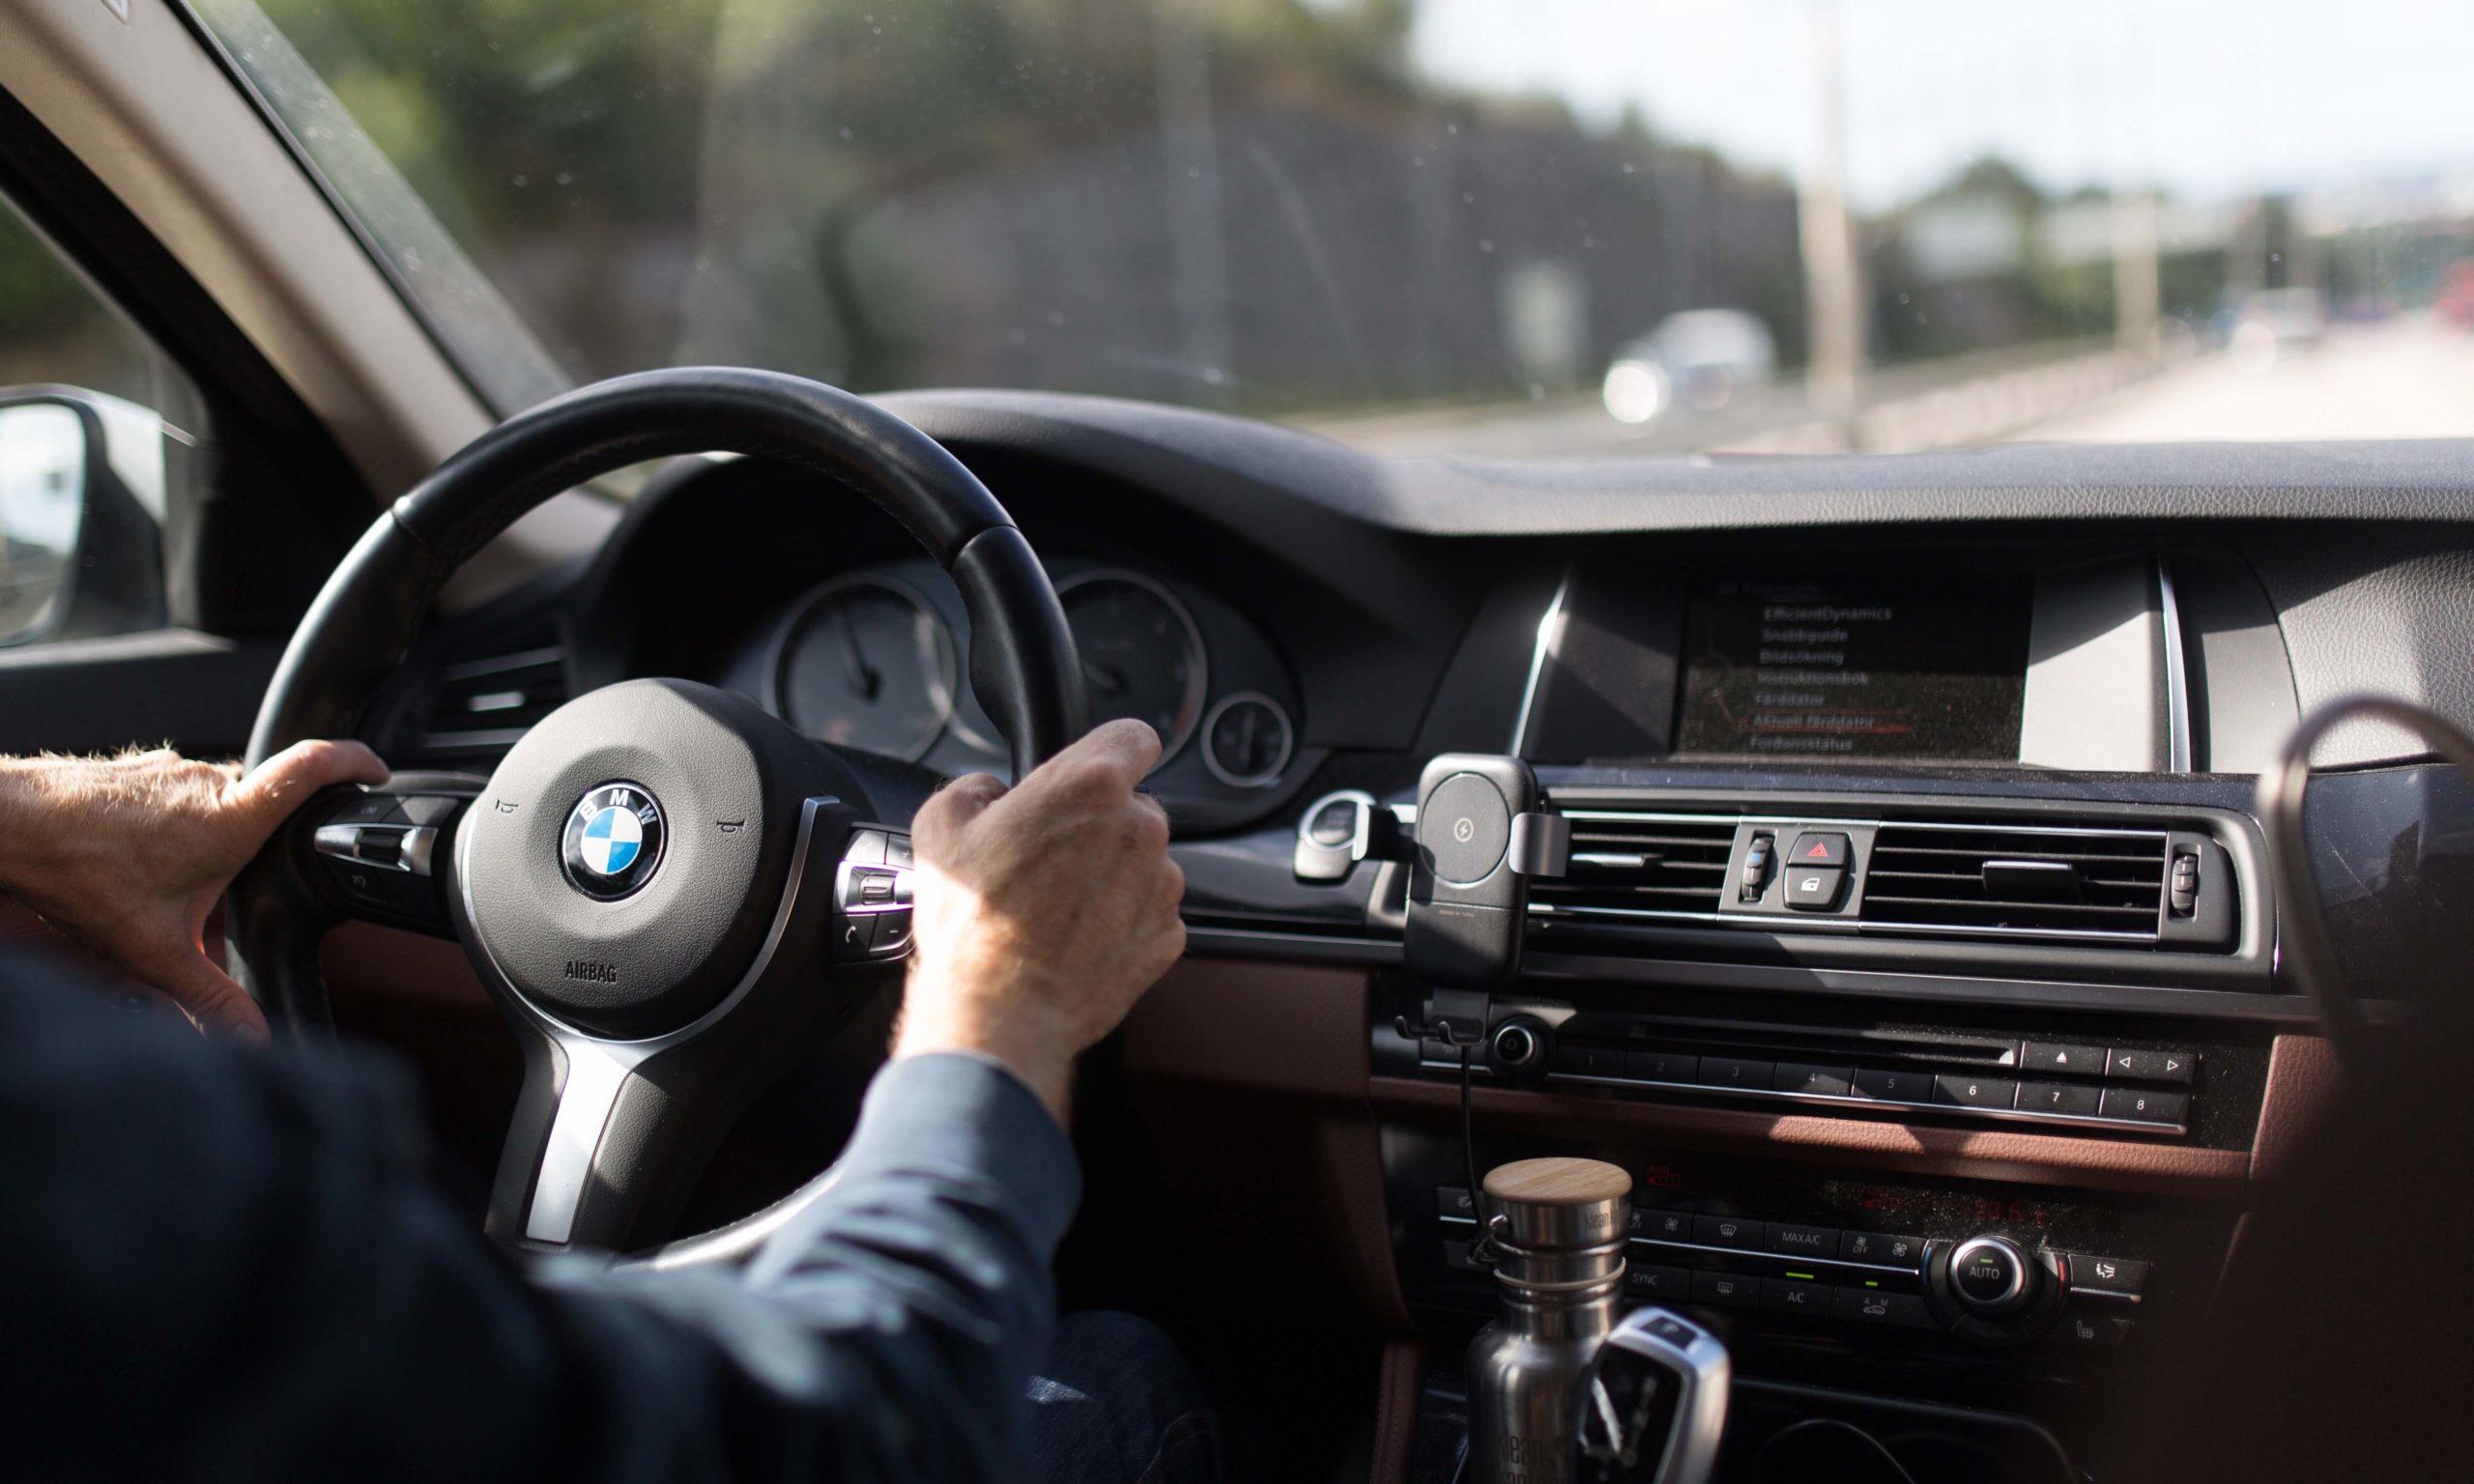 Driving-With-Without-Brake Pads-Expensive Breakdowns-Repairs-Slow Response-Soft Pedals-Vibration-Loud Noise-Roadside Assistance-Sponge-Endurance Advantage-Endurance Elite-